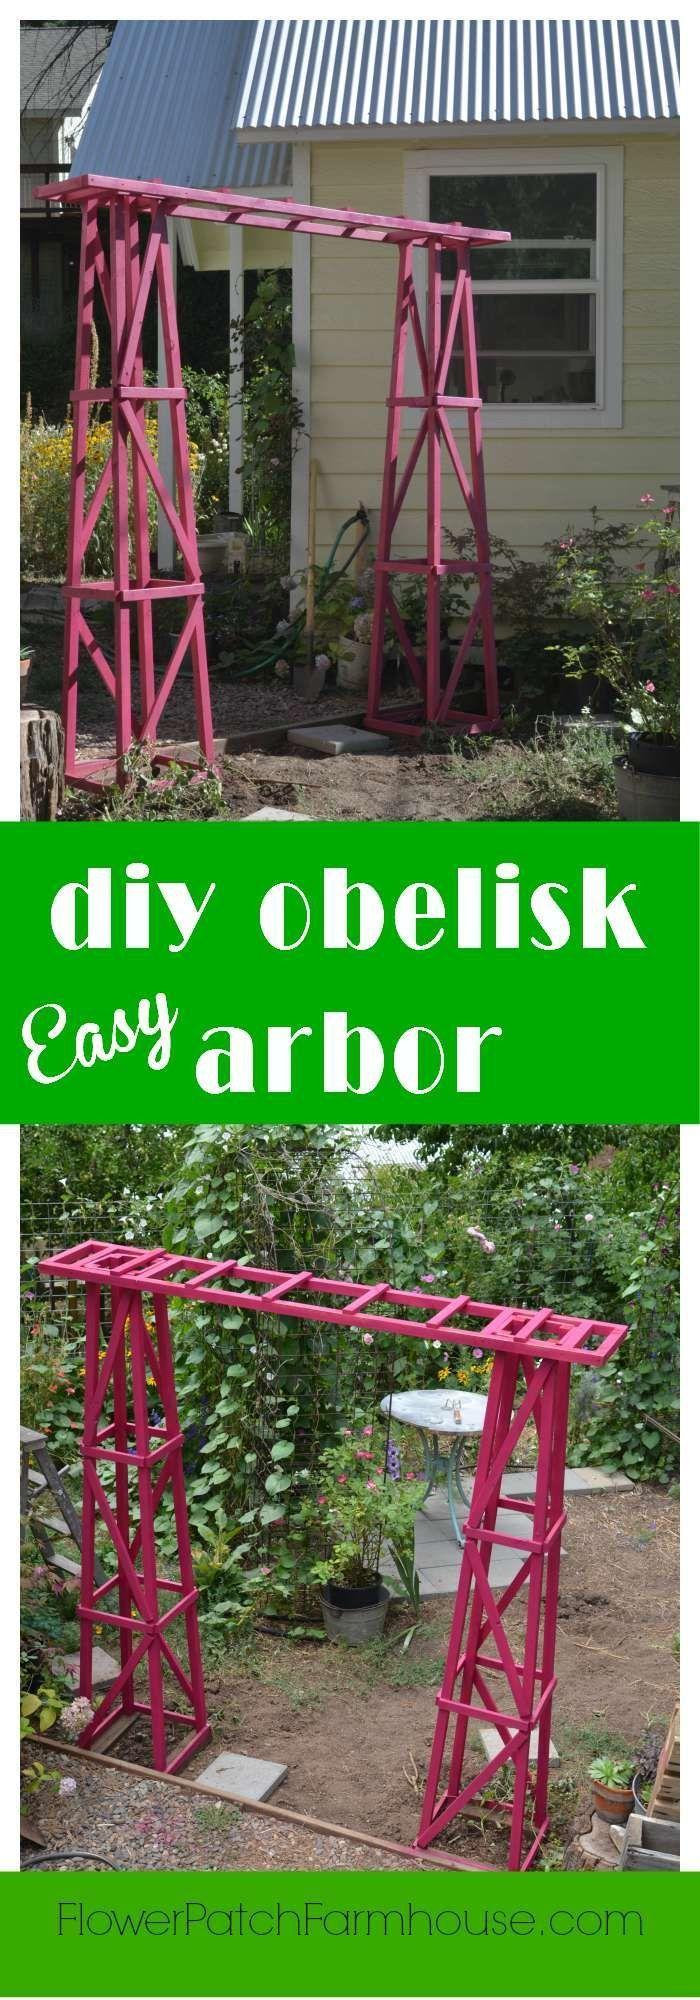 Homemade garden art ideas - Best 25 Garden Structures Ideas On Pinterest Plant Trellis Privacy Trellis And Bamboo Garden Ideas